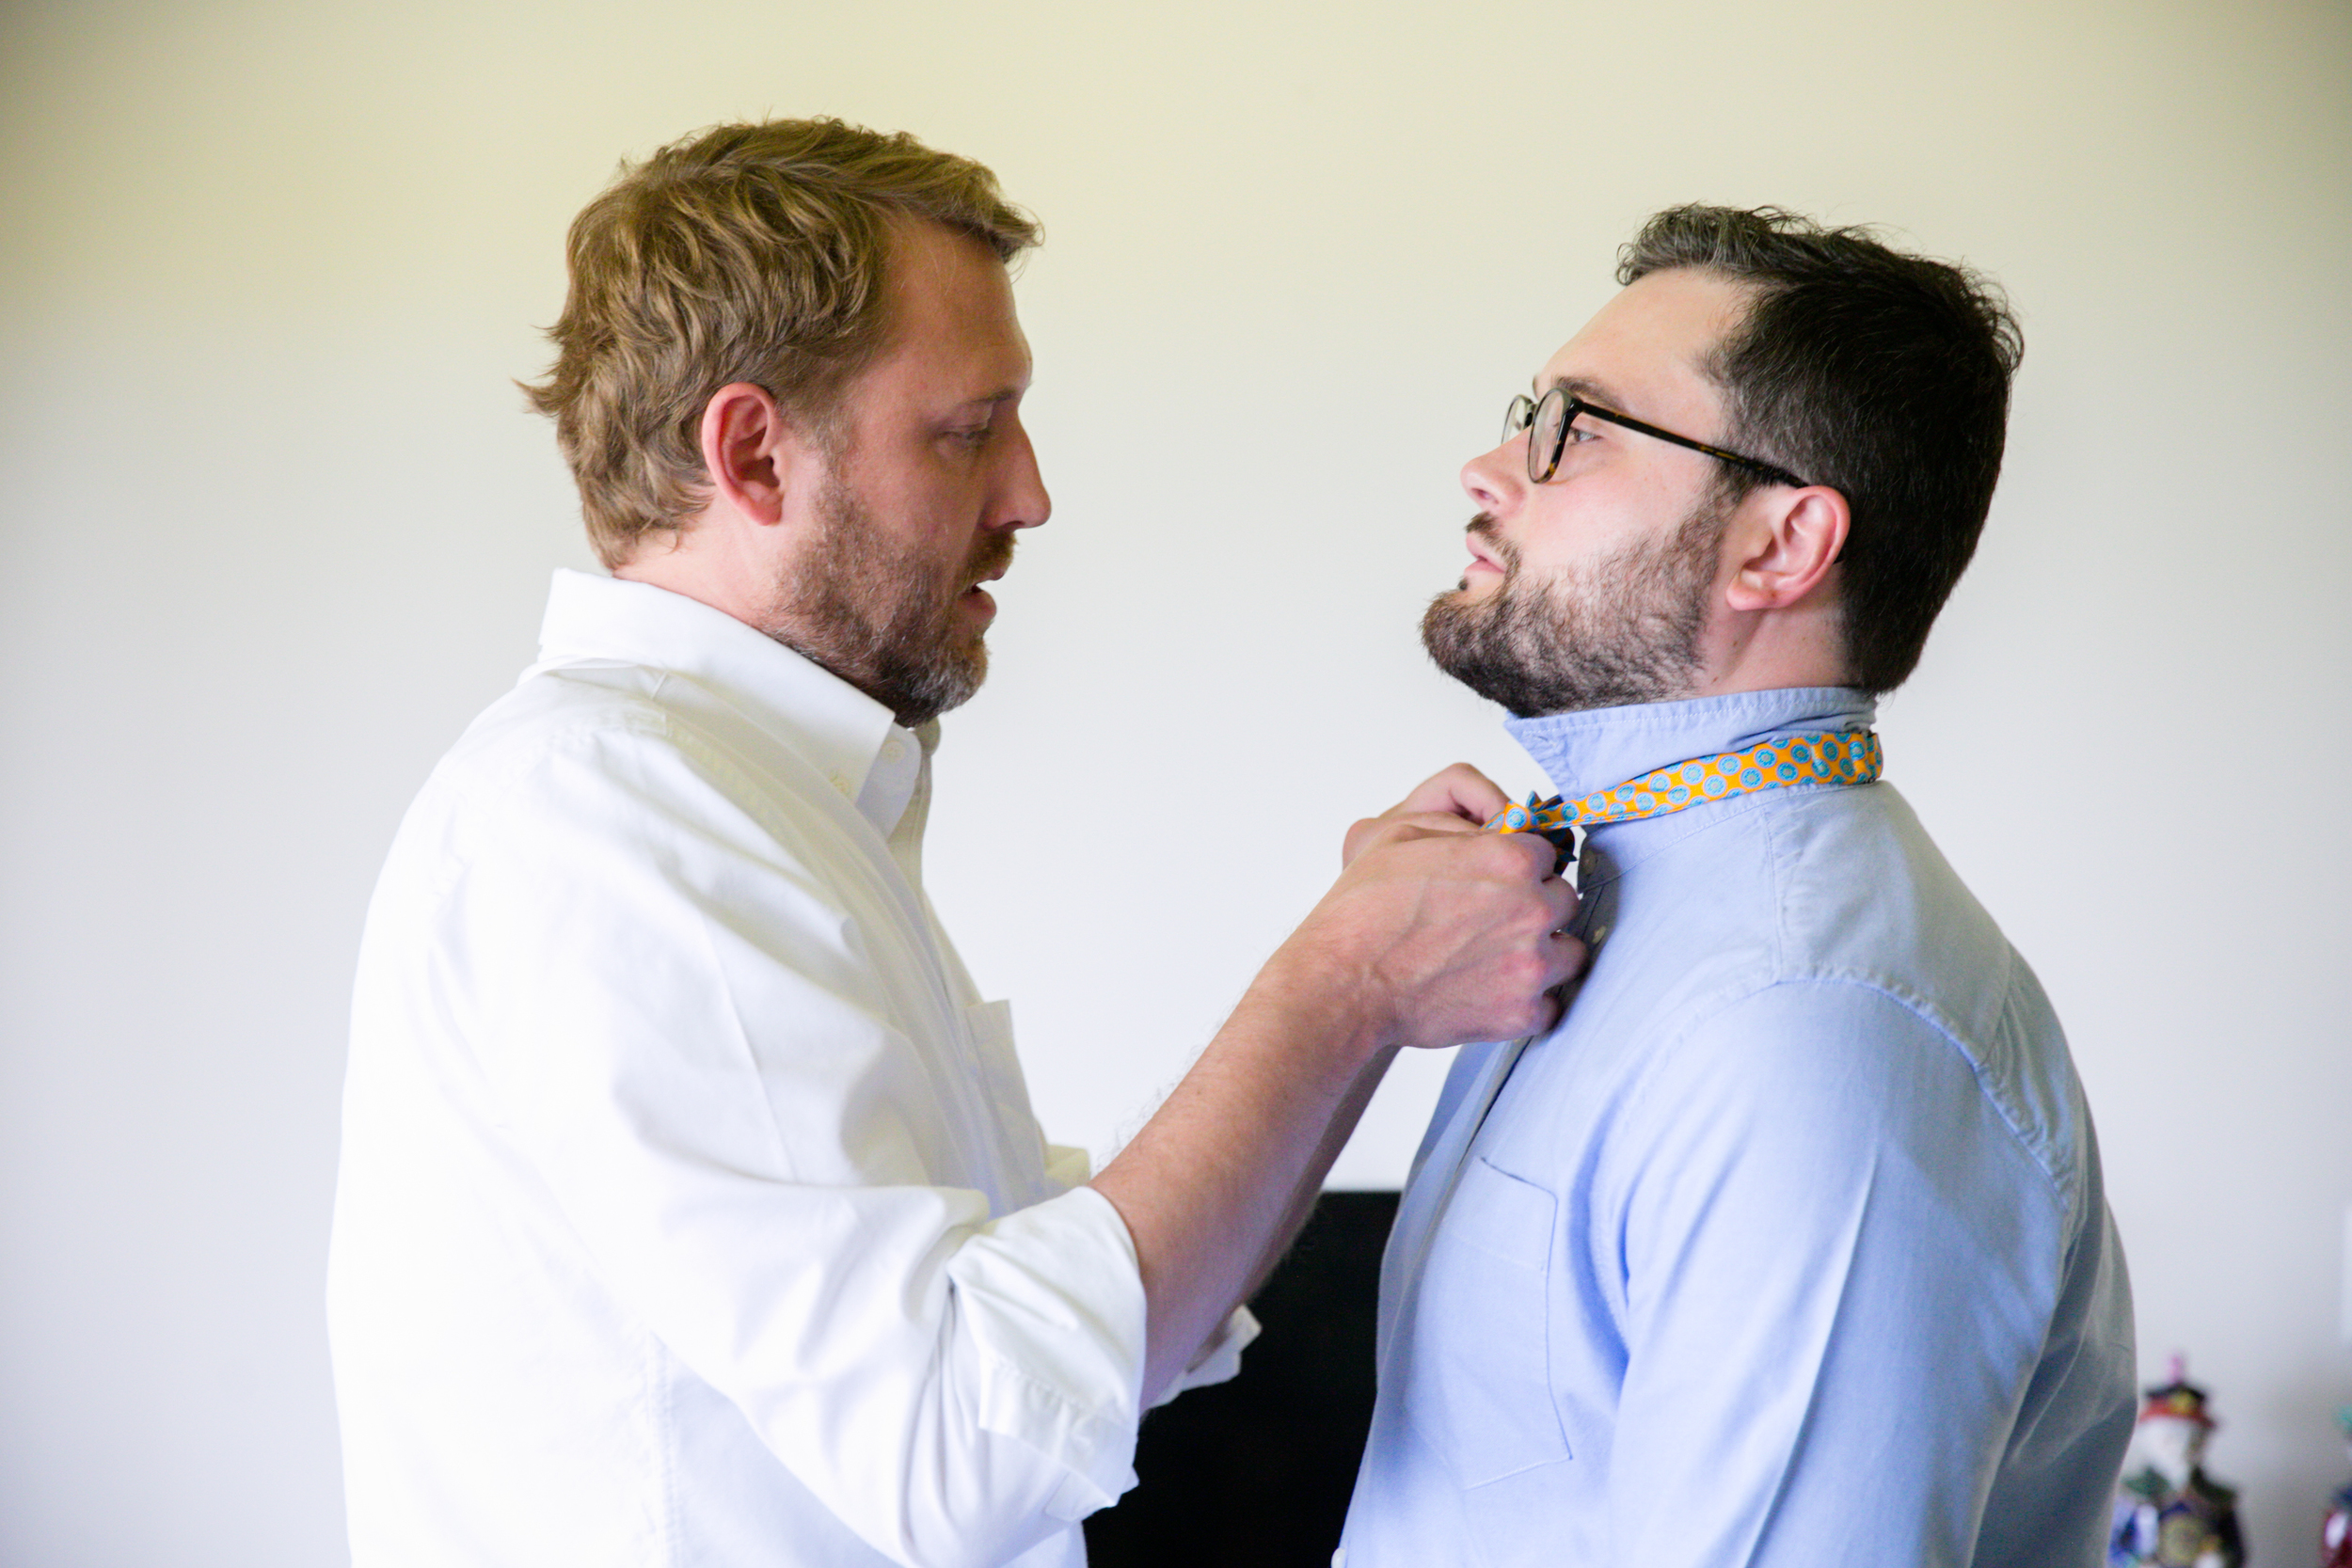 Lisa25 Wedding Photography groom tying fiancé's tie